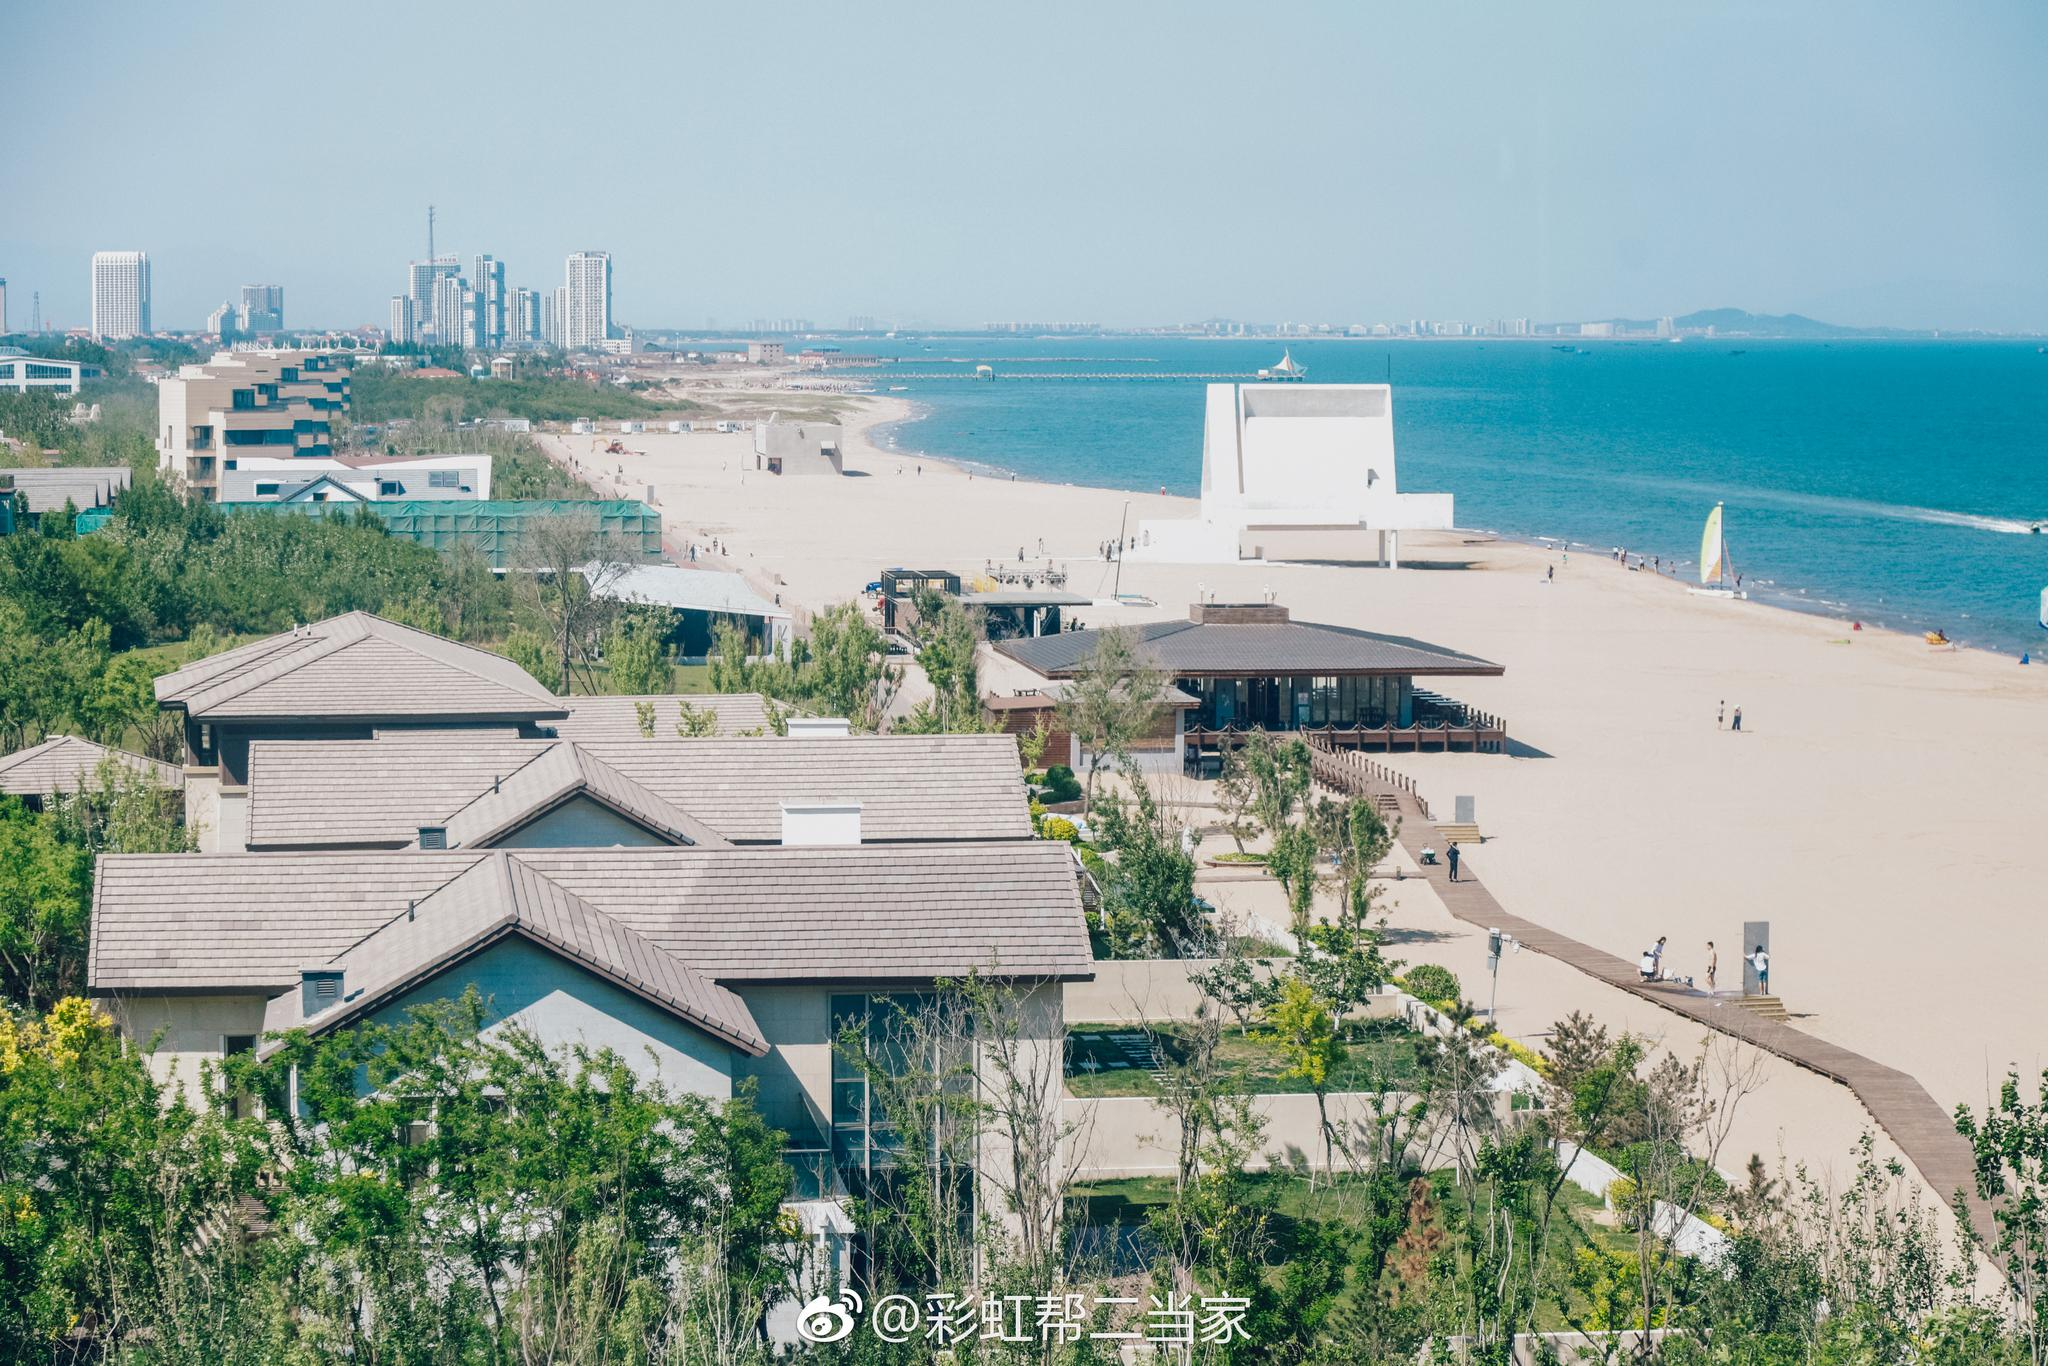 club med joyview 北戴河黄金海岸度假村已经正式开业